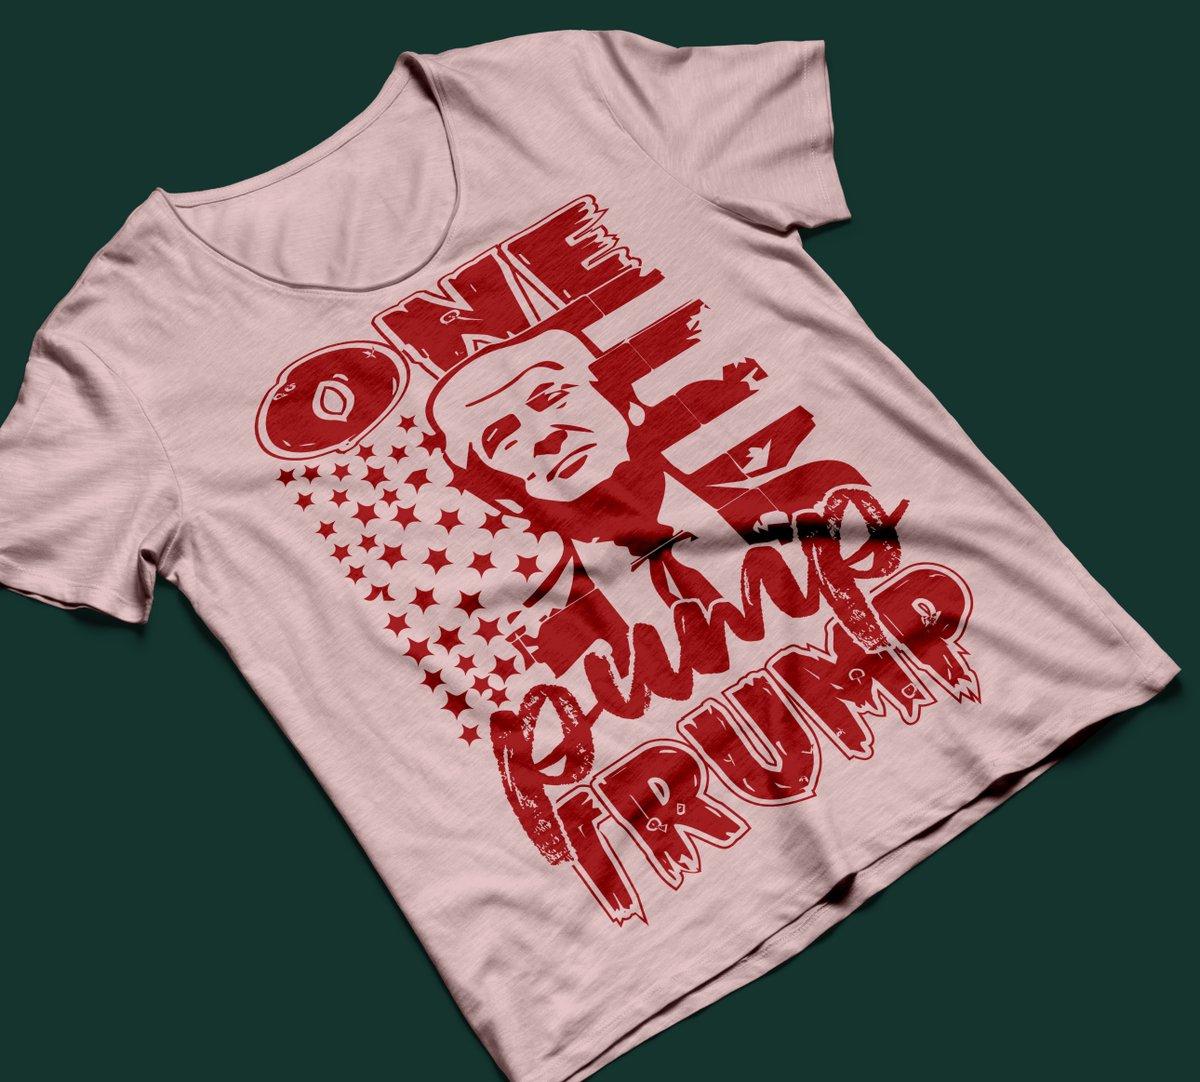 #Hi there, this is my new t-shirt design in full view here.  Whatsup number+8801762602274 #teeshirt #tshirtcouple  #Eagleslover #tshirts #tshirt #design #Logodesigner #fashion #branding #catlover #BonJennieversaire #Trump